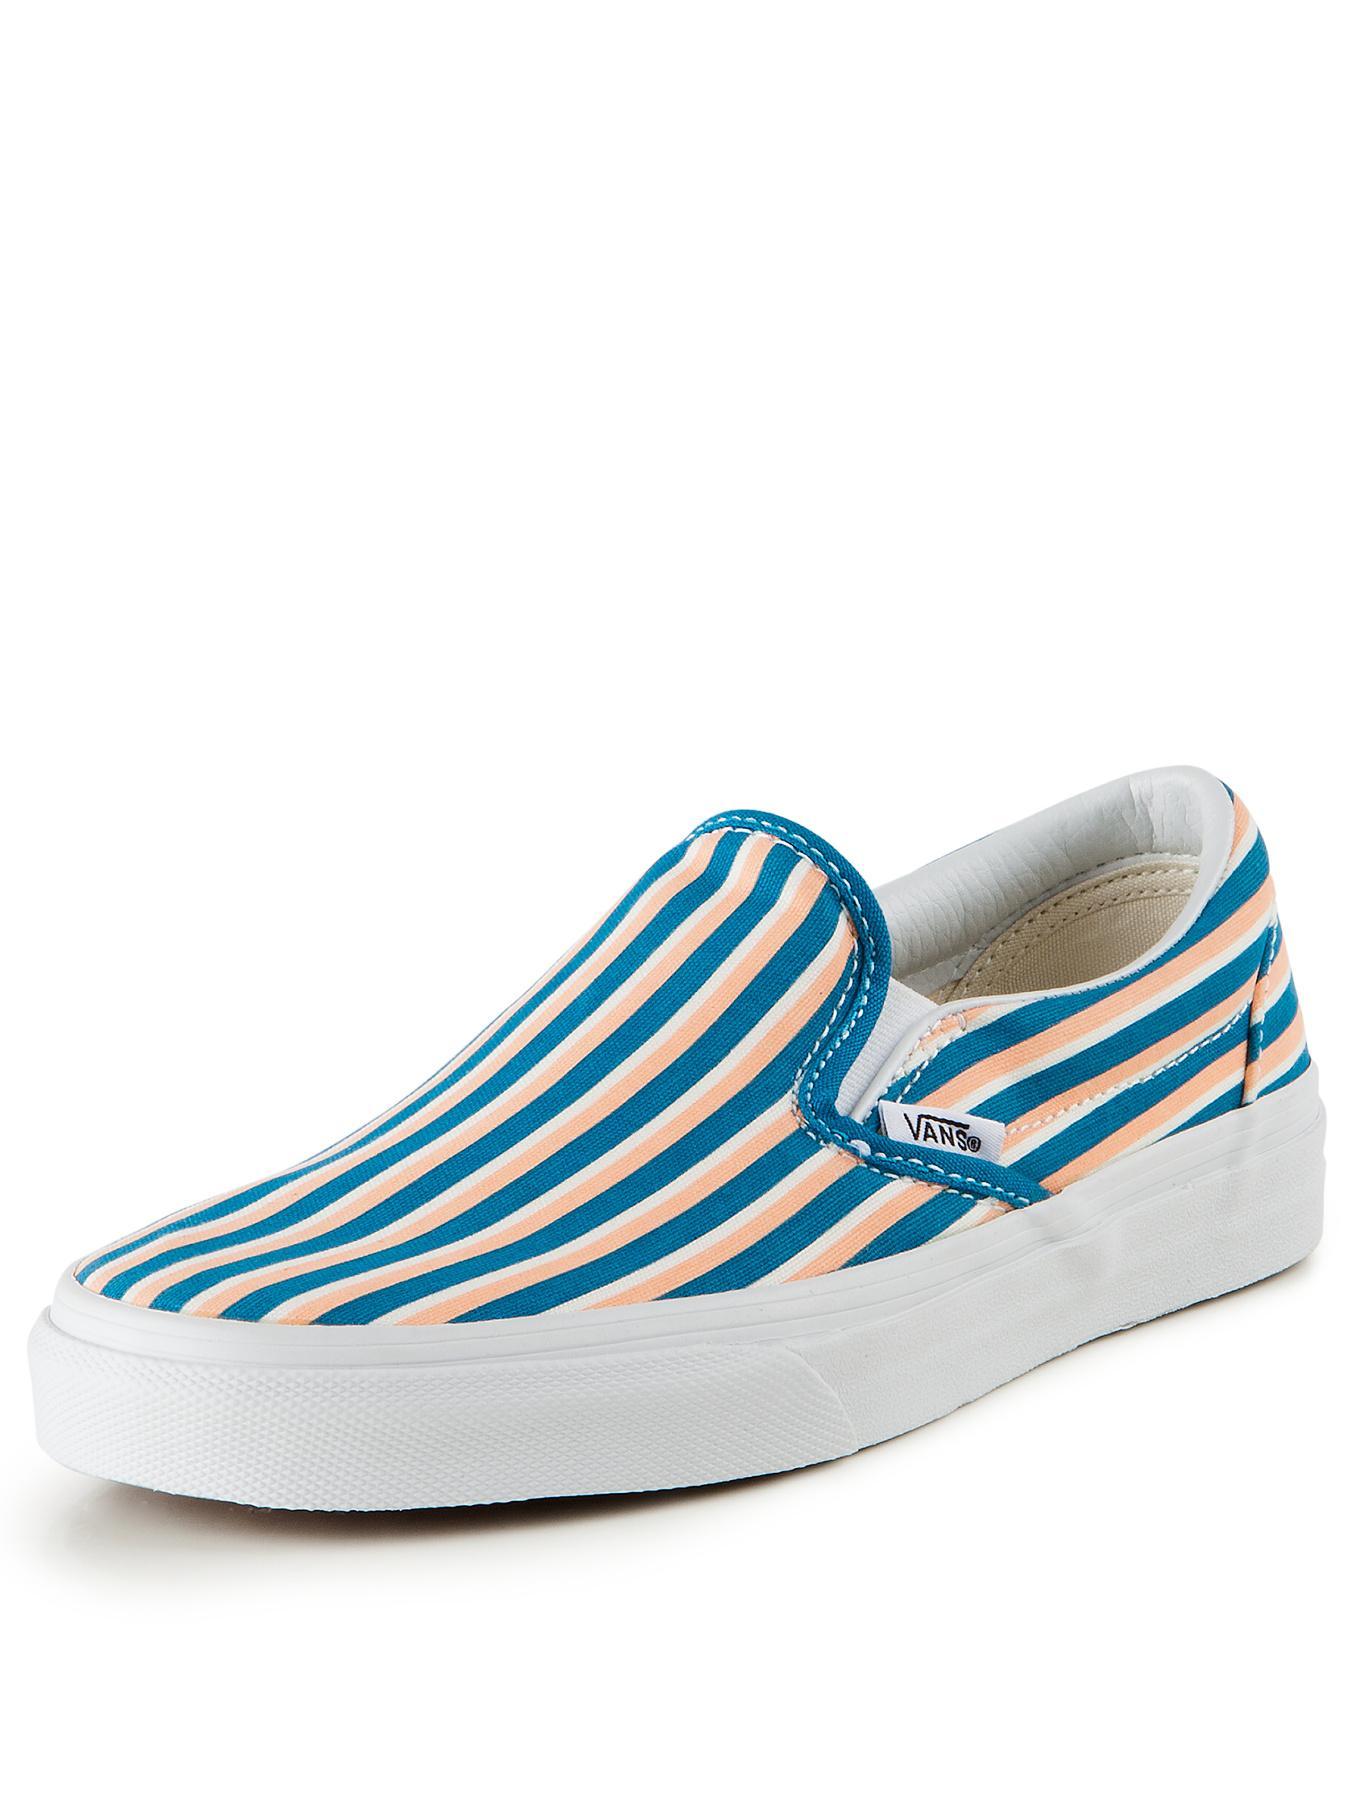 Vans Classic Slip-On Stripe Plimsolls - Teal, Teal